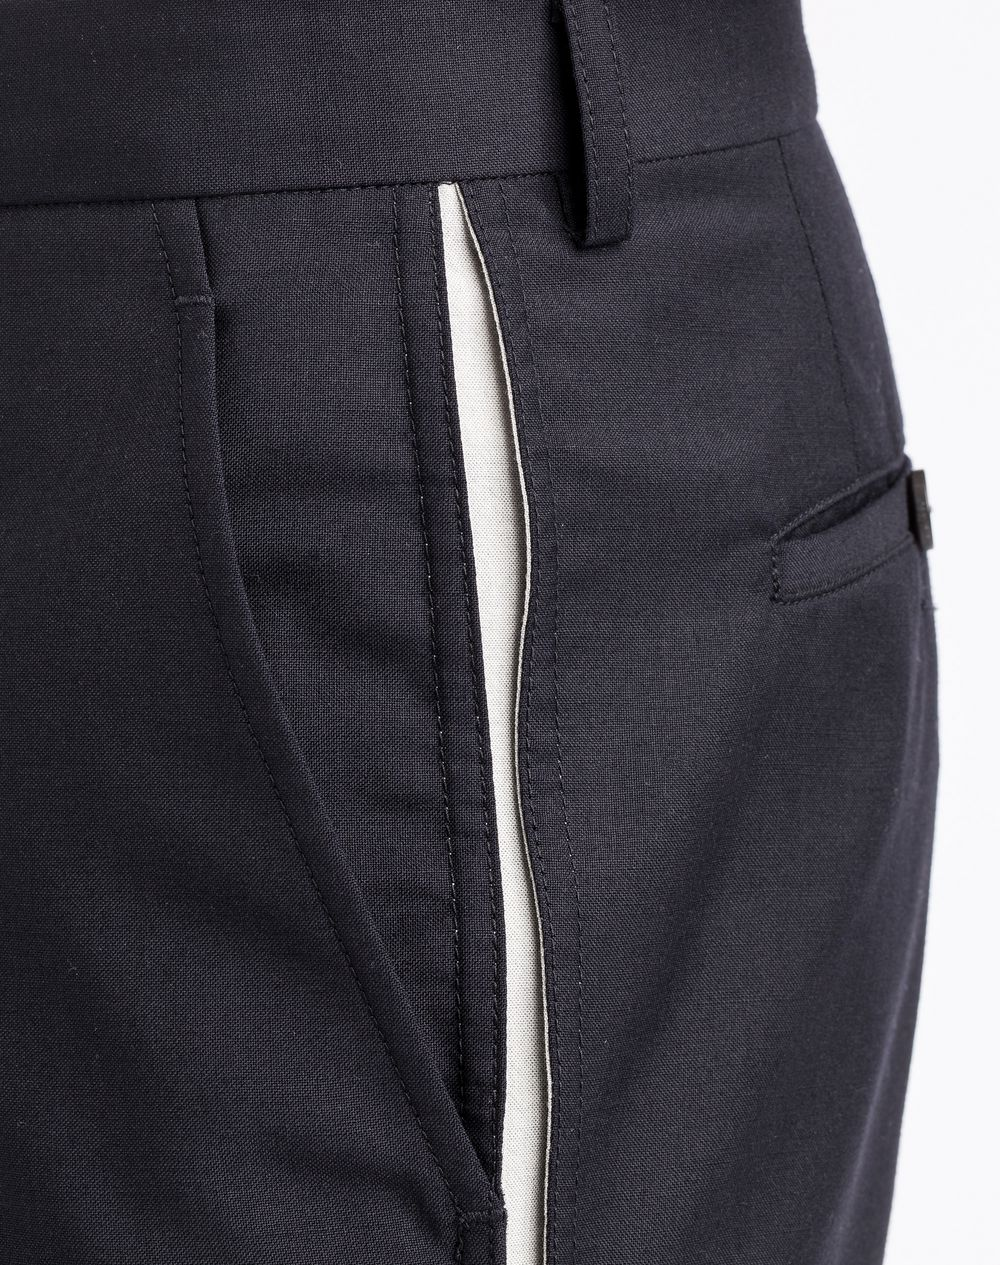 Pantalon slim bande contrast e c t lanvin pantalon homme - Pantalon bande laterale homme ...